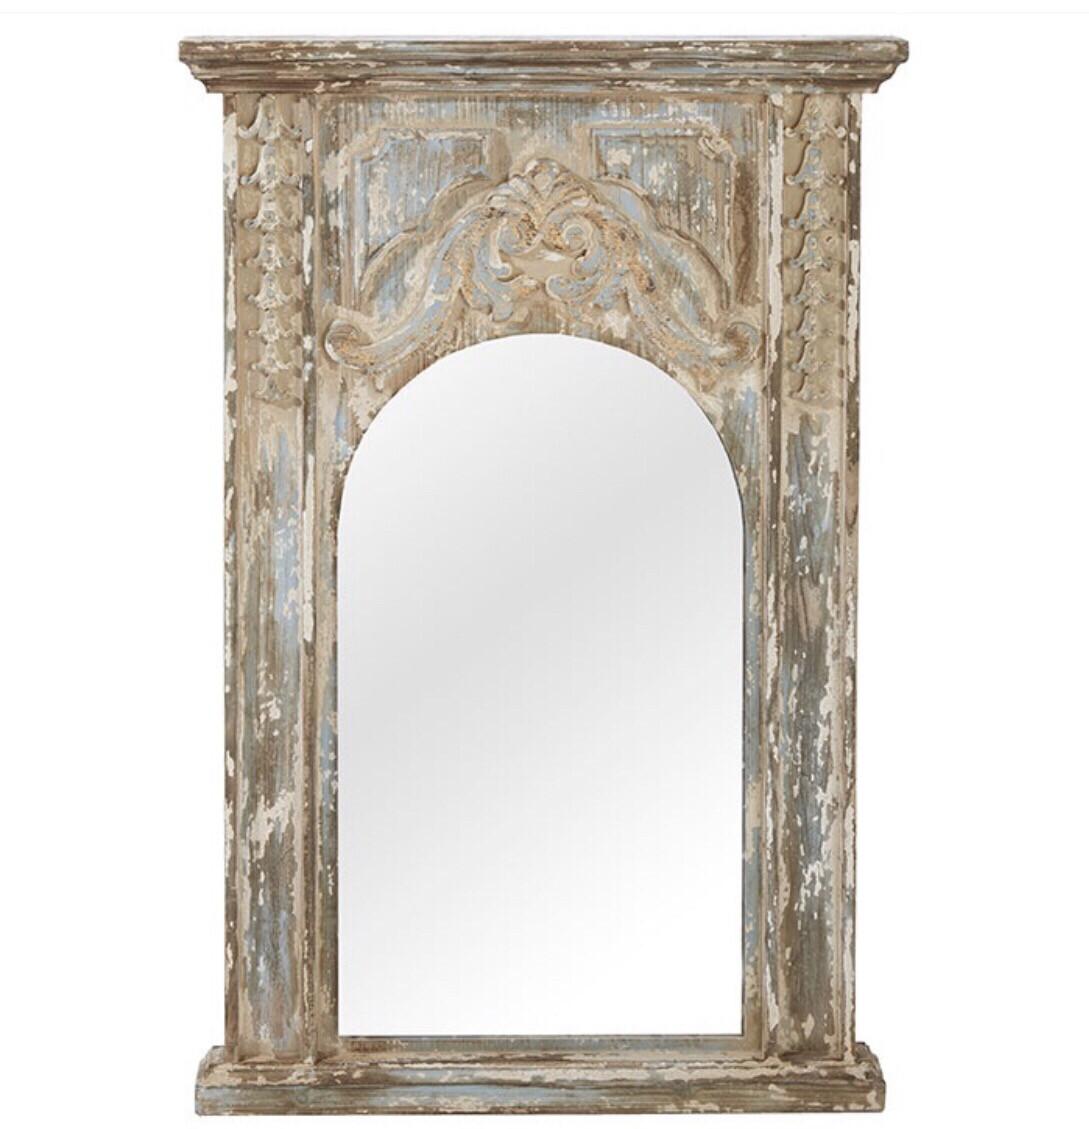 Distressed Paris Market Mirror